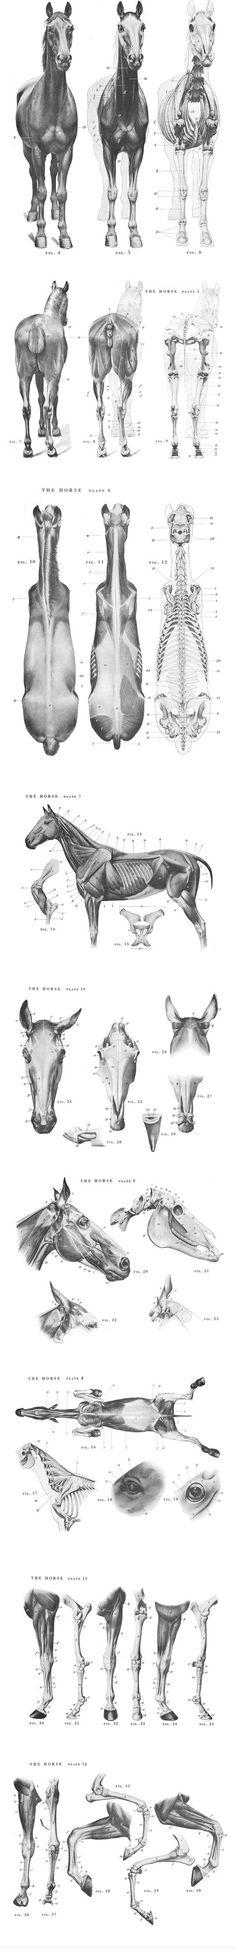 horse anatomy: